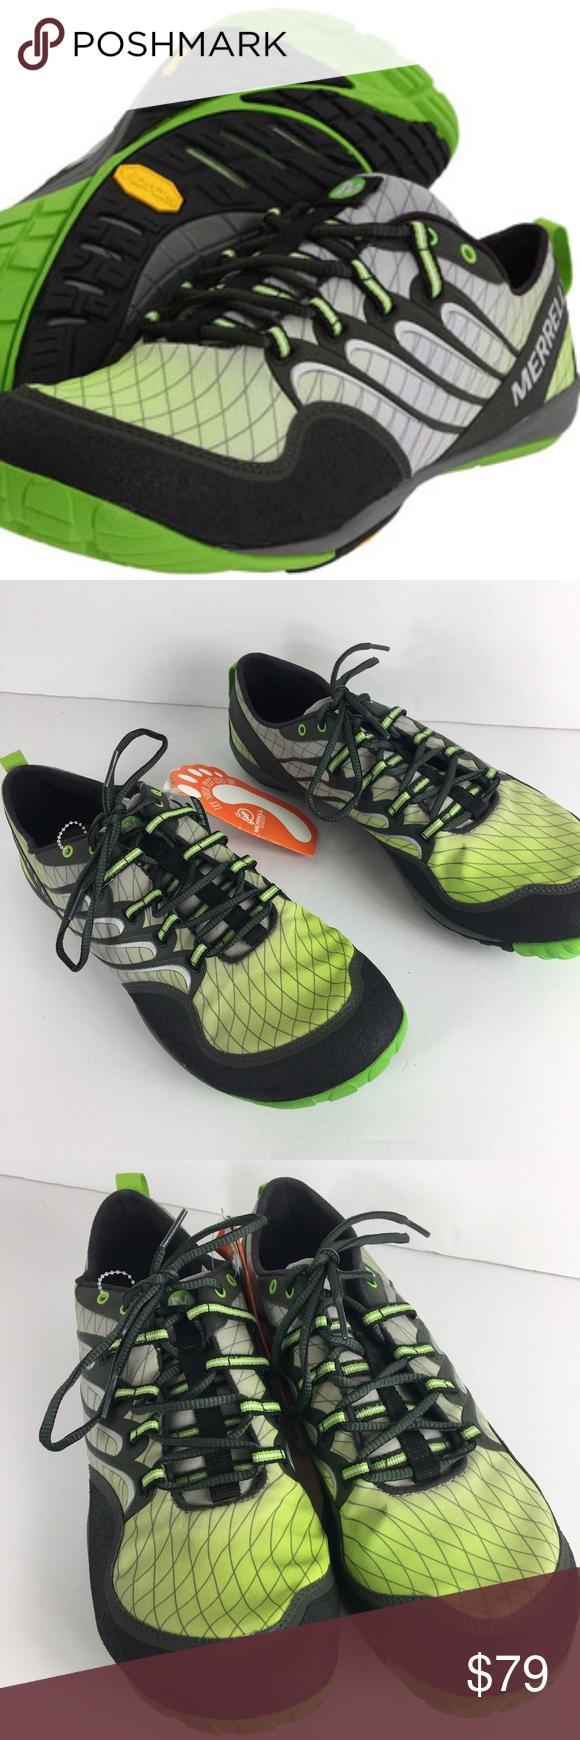 merrell walking shoes size 13 nike